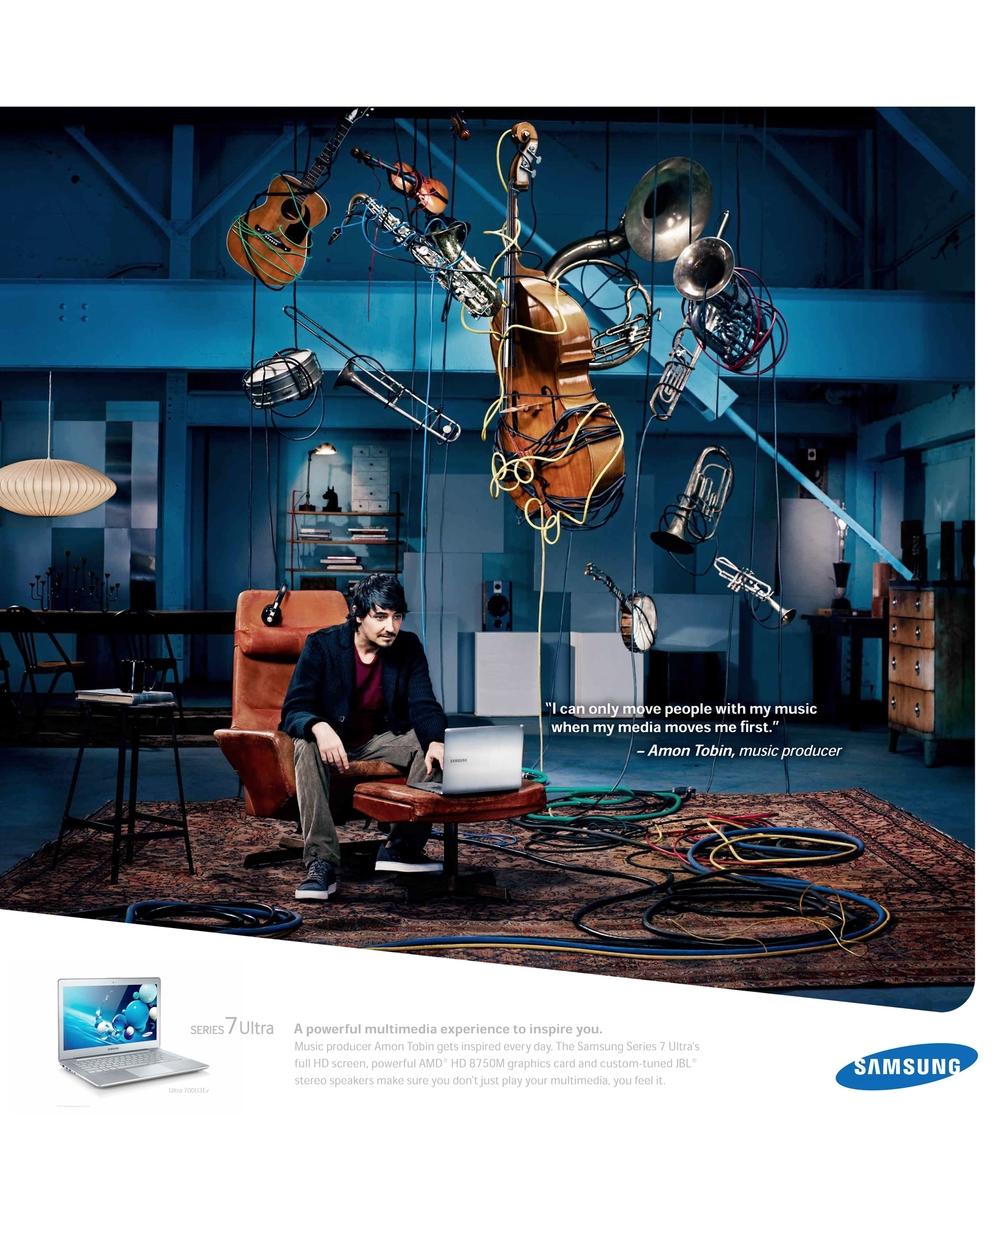 Samsung_Amon_Tobin_PD171114_1a03_Amon_CESOOH_QSES2934.jpg